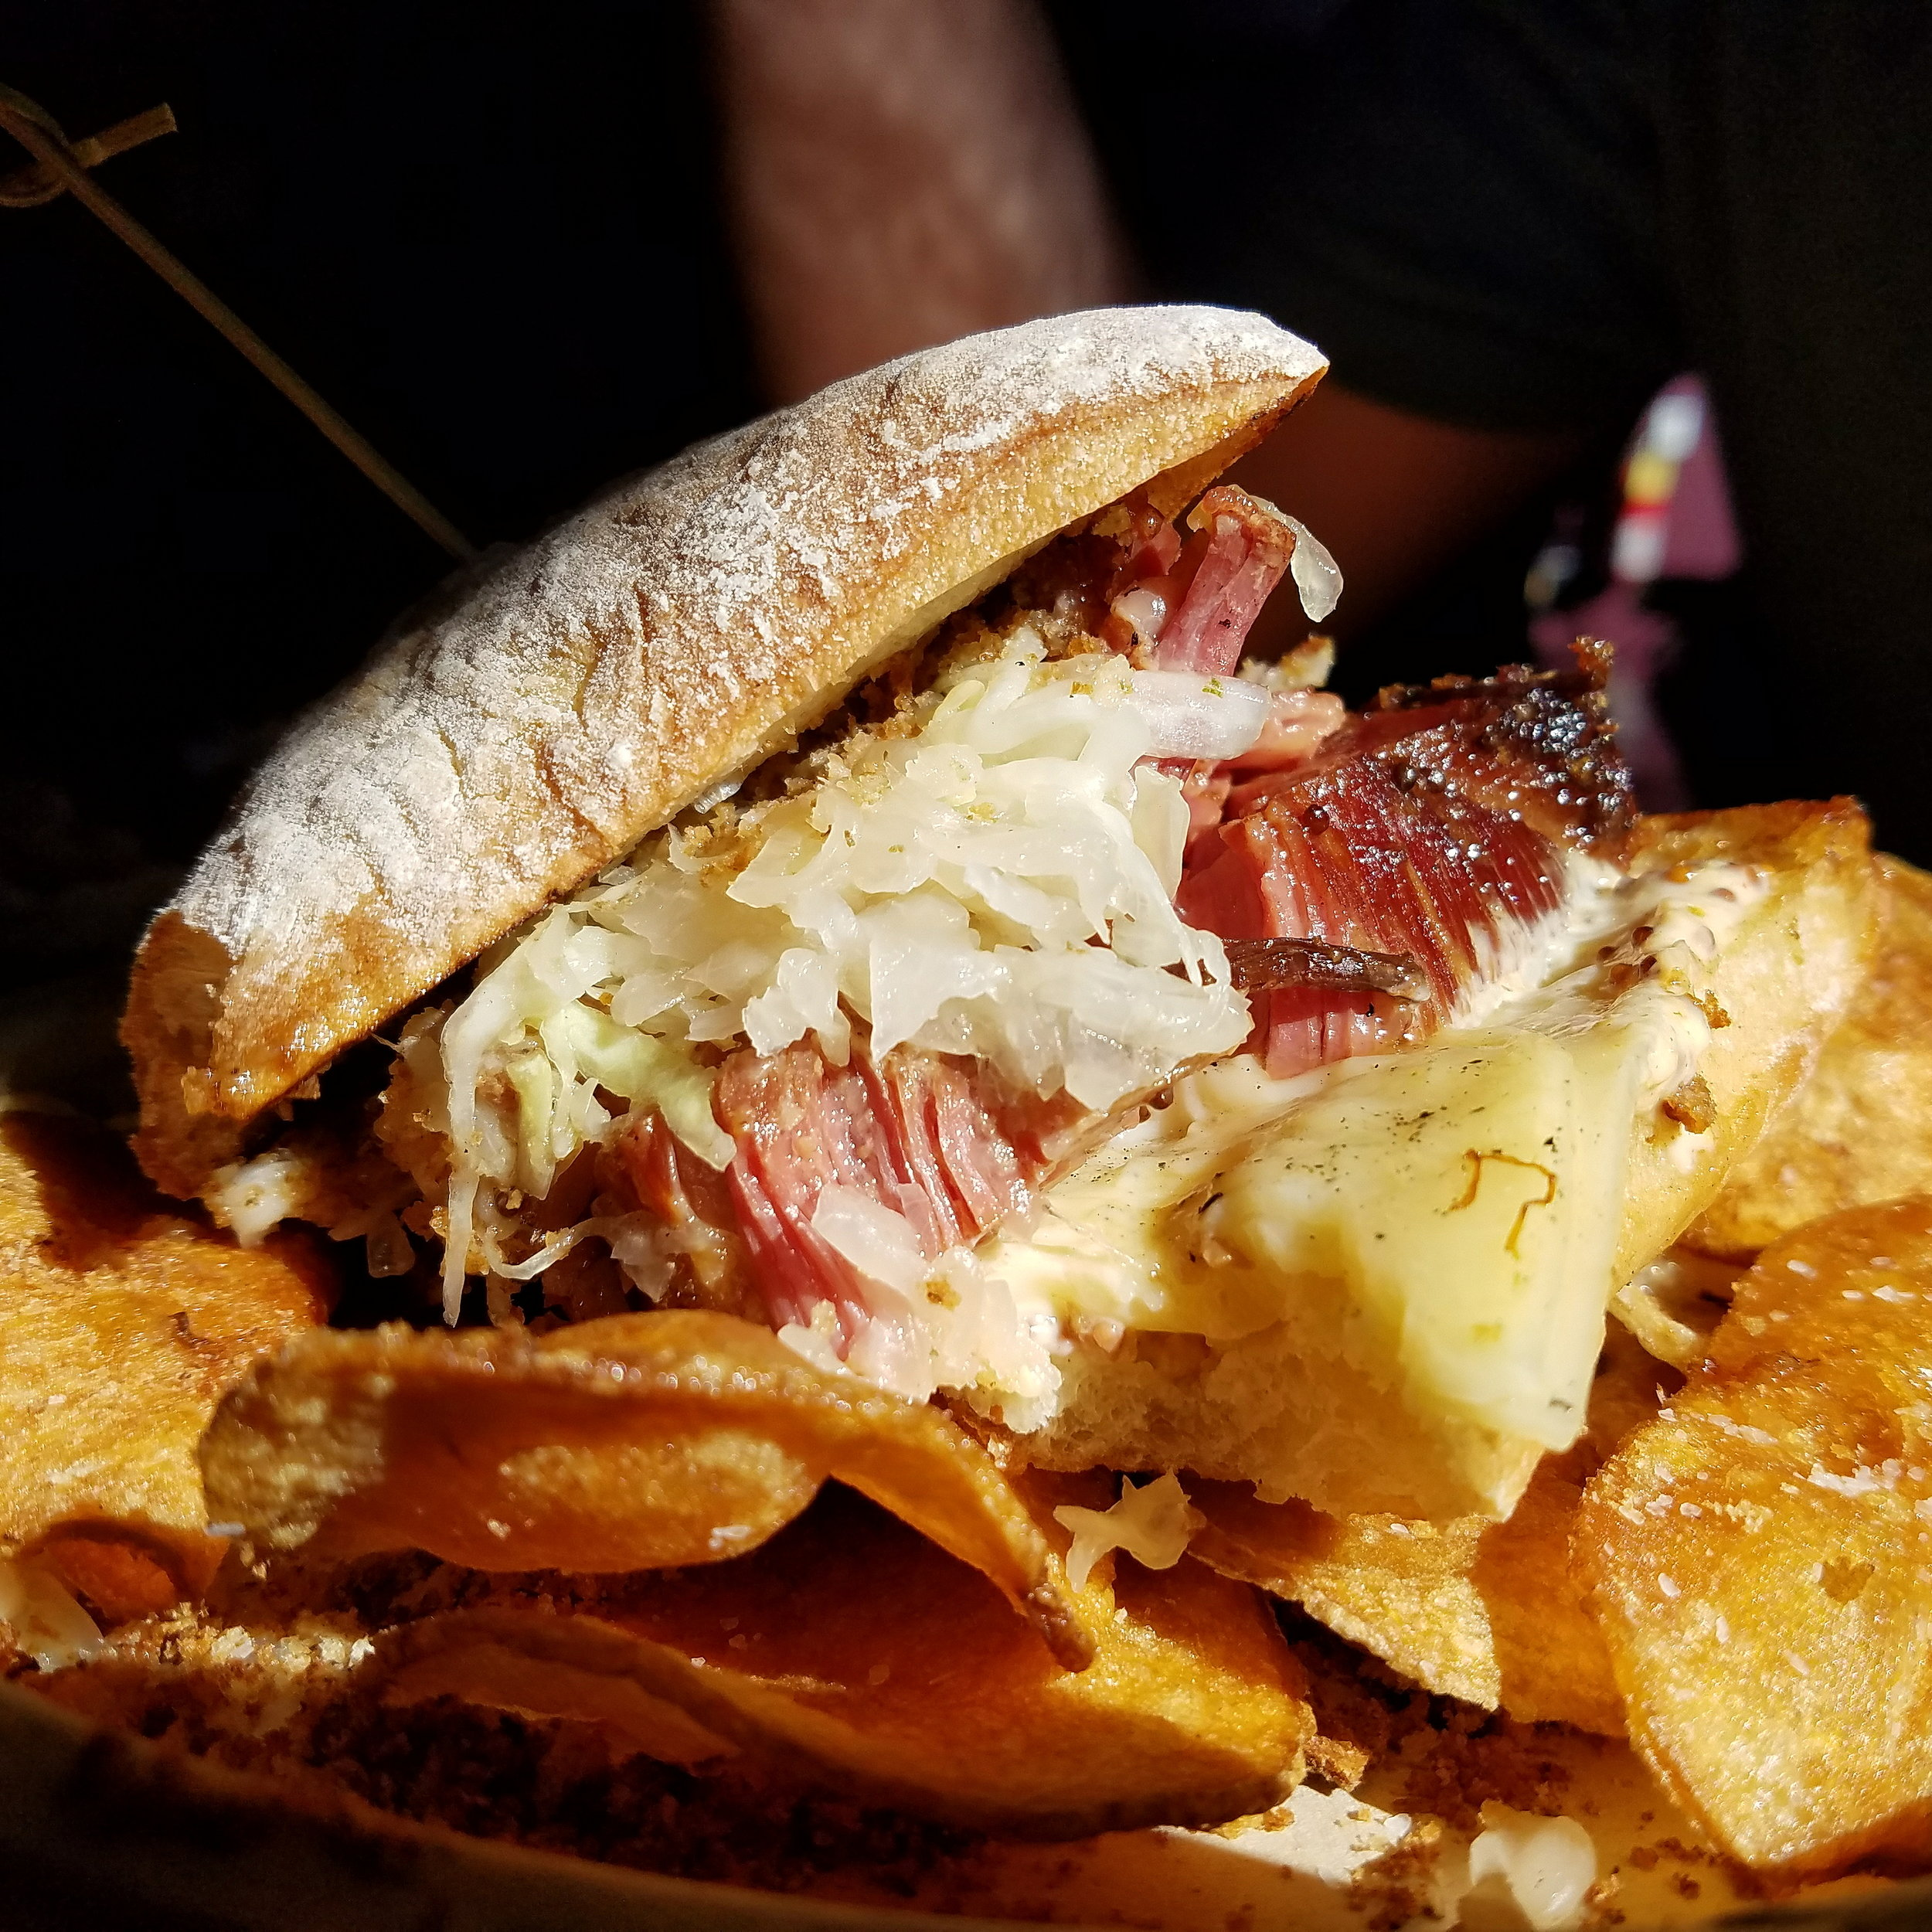 Definitely the best corned beef sandwich EVER